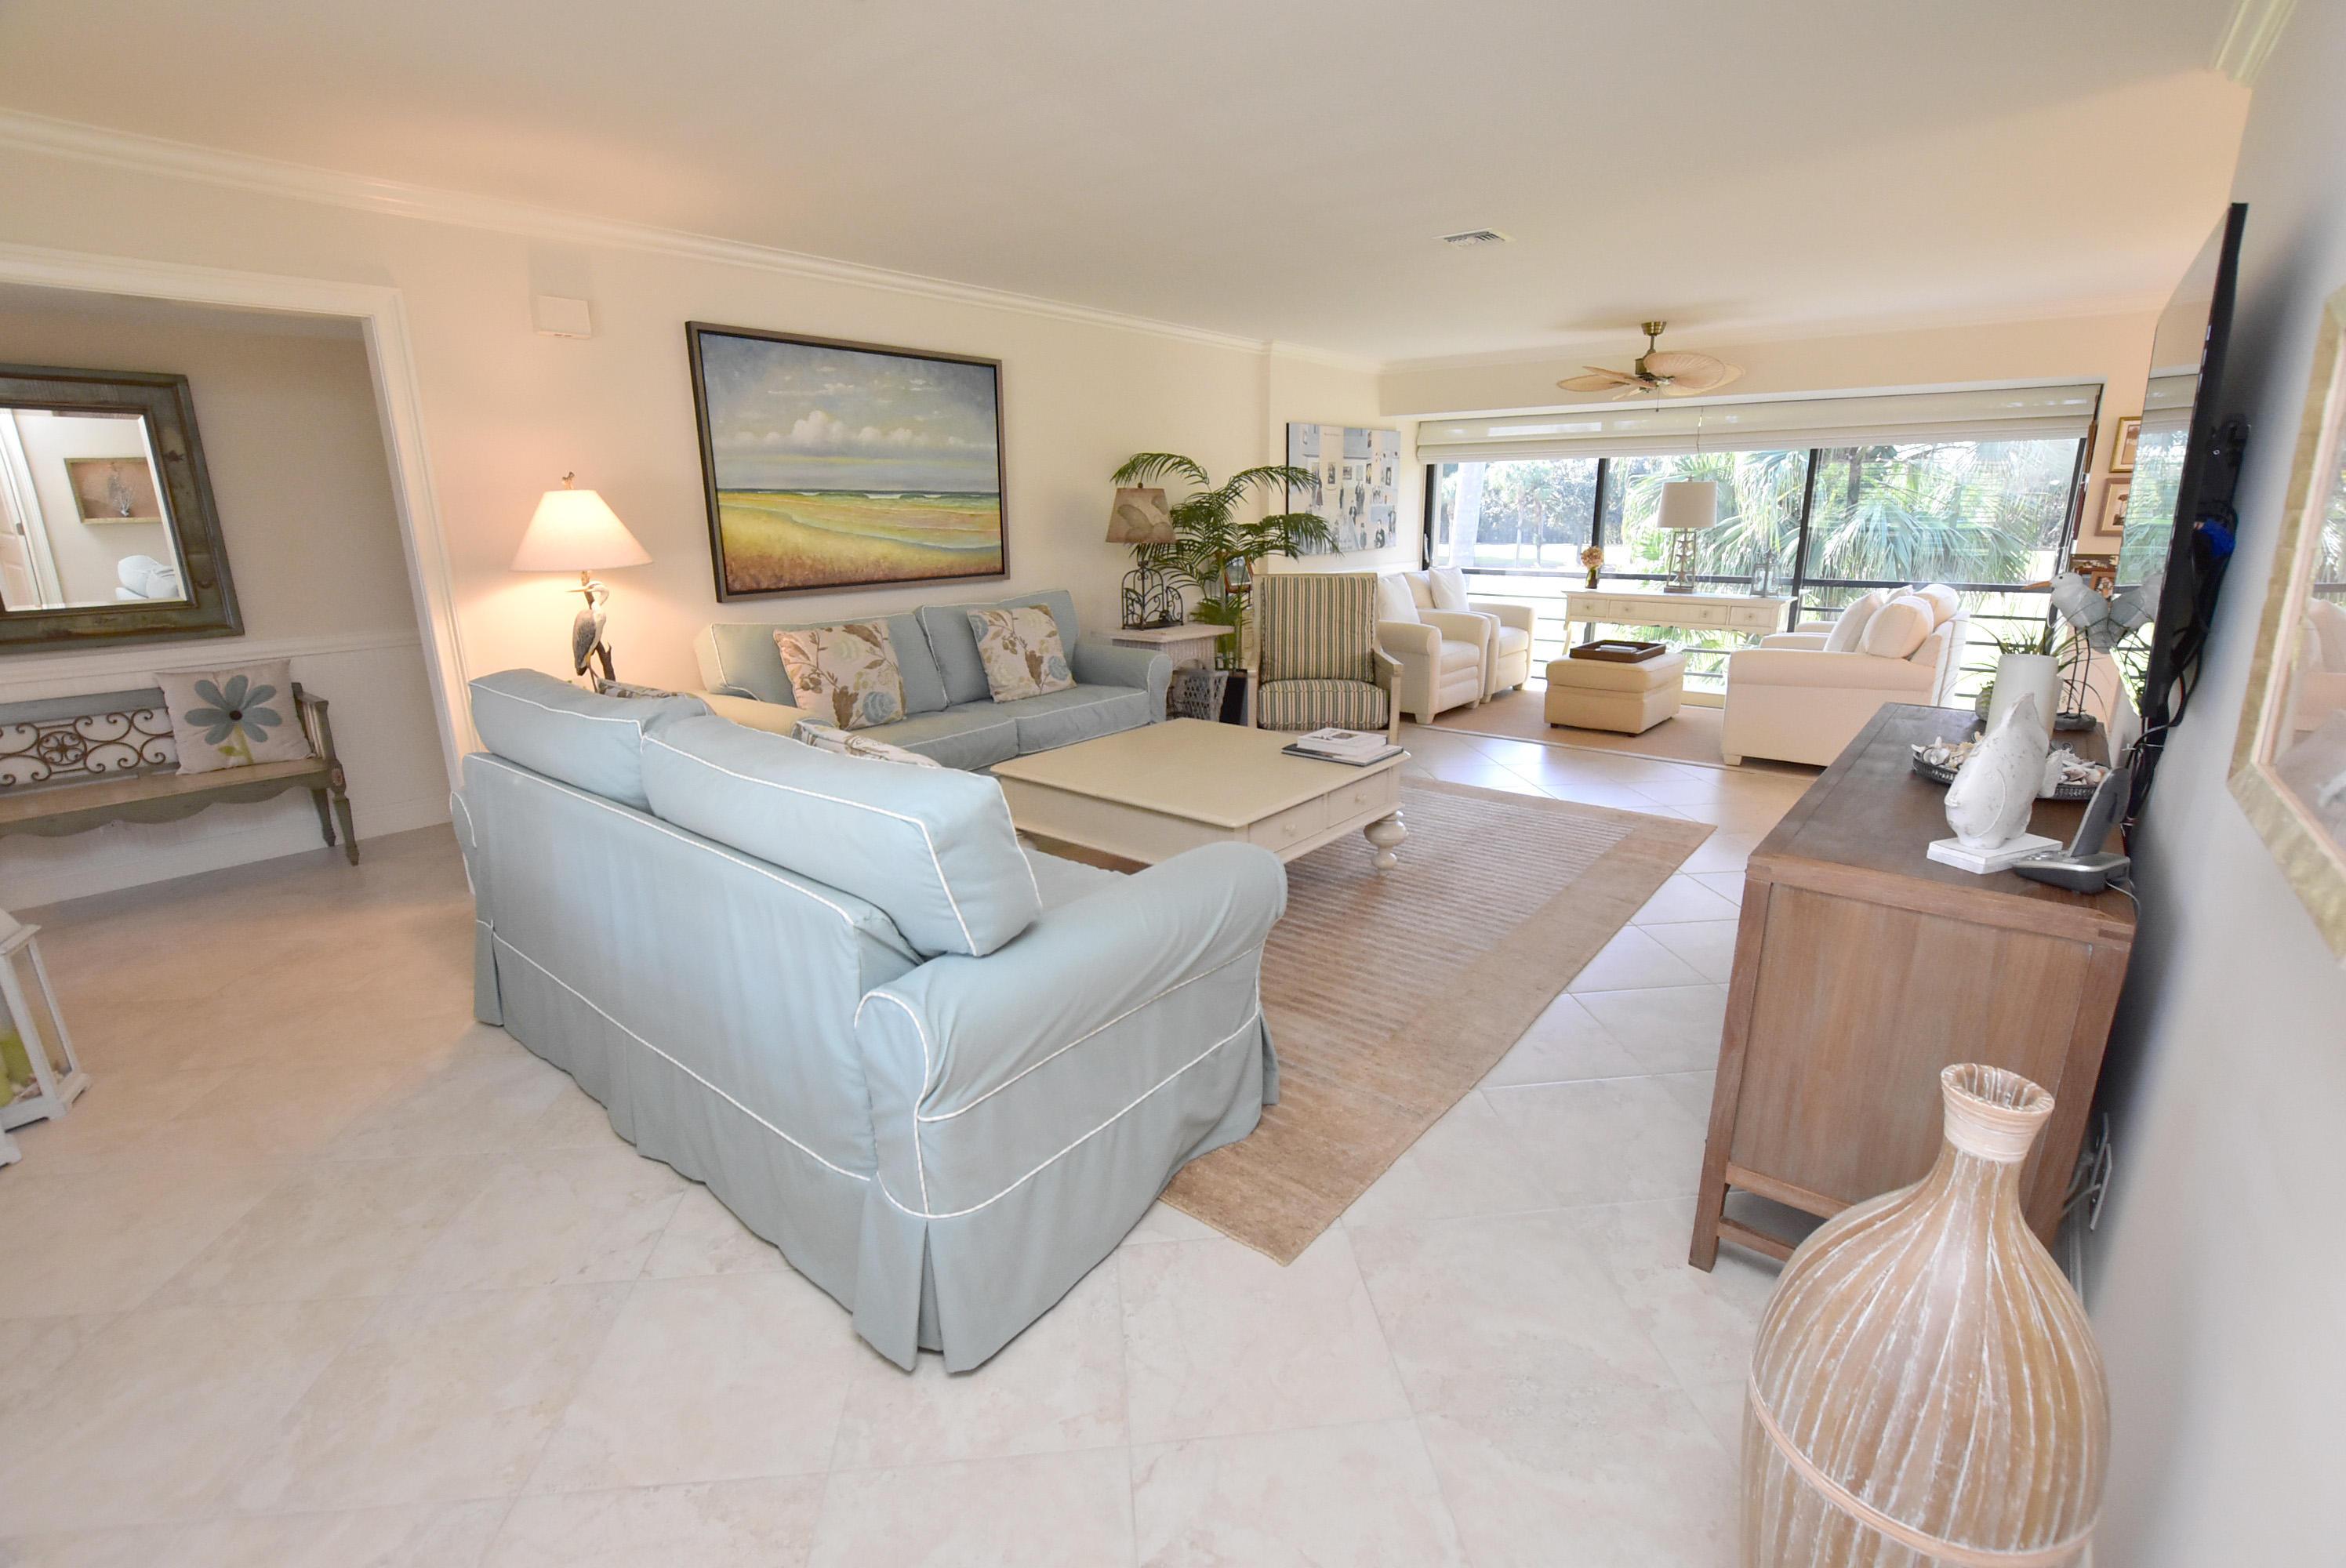 10241 Quail Covey Road Hibiscus S, Boynton Beach, Florida 33436, 2 Bedrooms Bedrooms, ,2 BathroomsBathrooms,A,Condominium,Quail Covey,RX-10579220